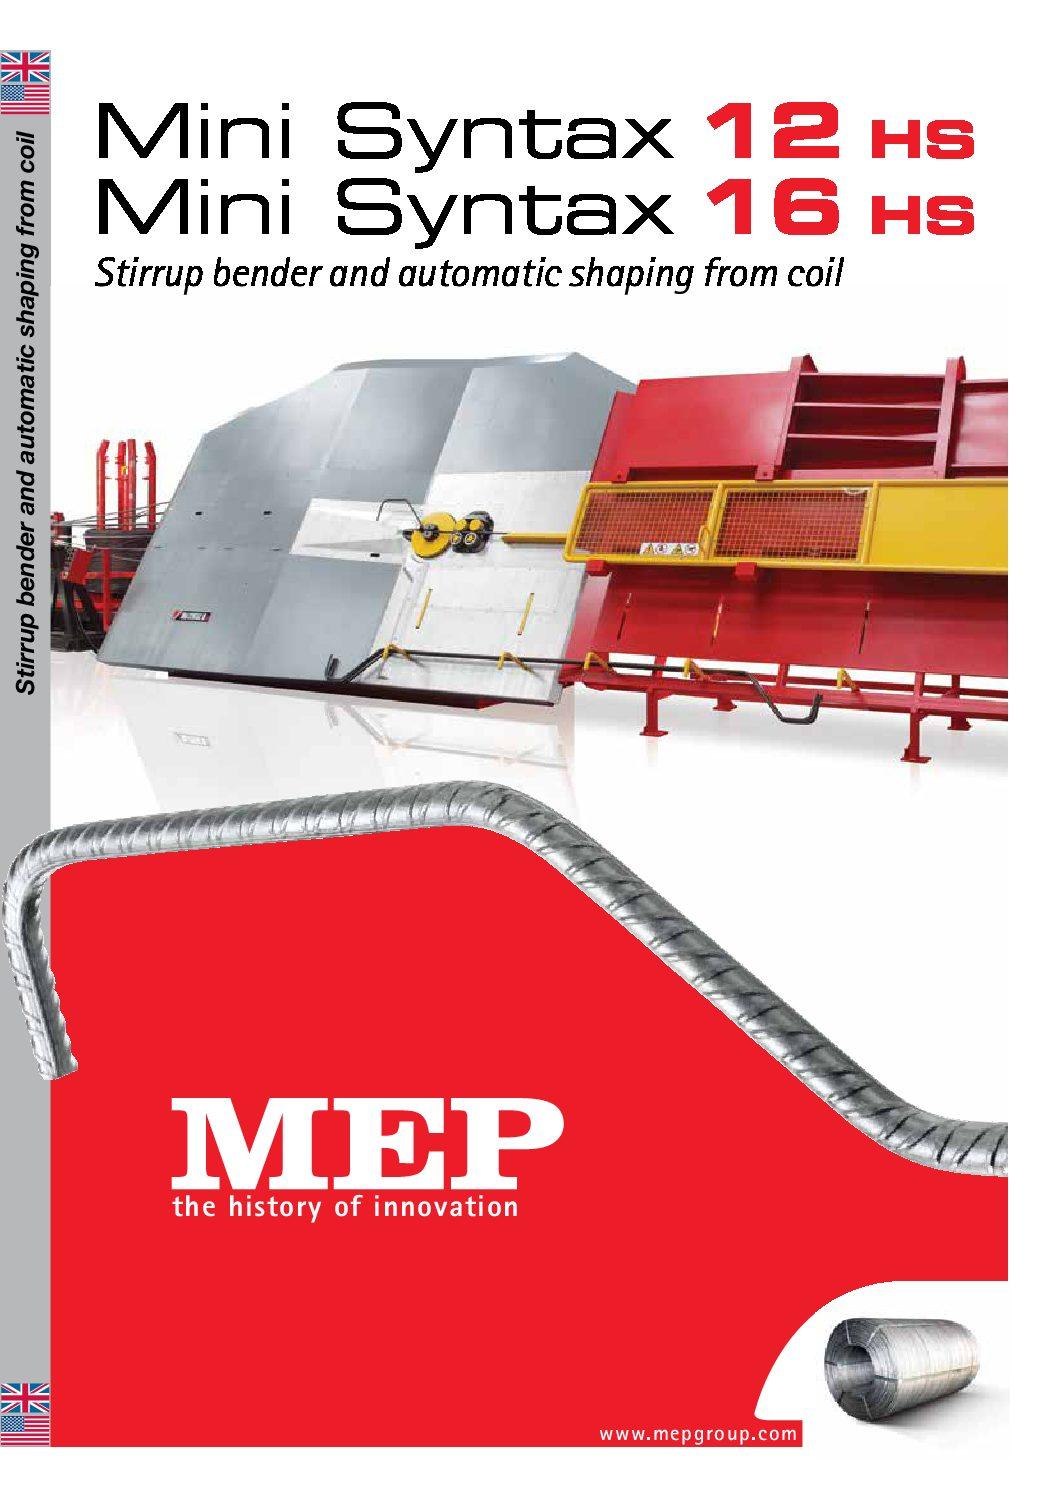 MEP - MiniSyntax 12-16 HS